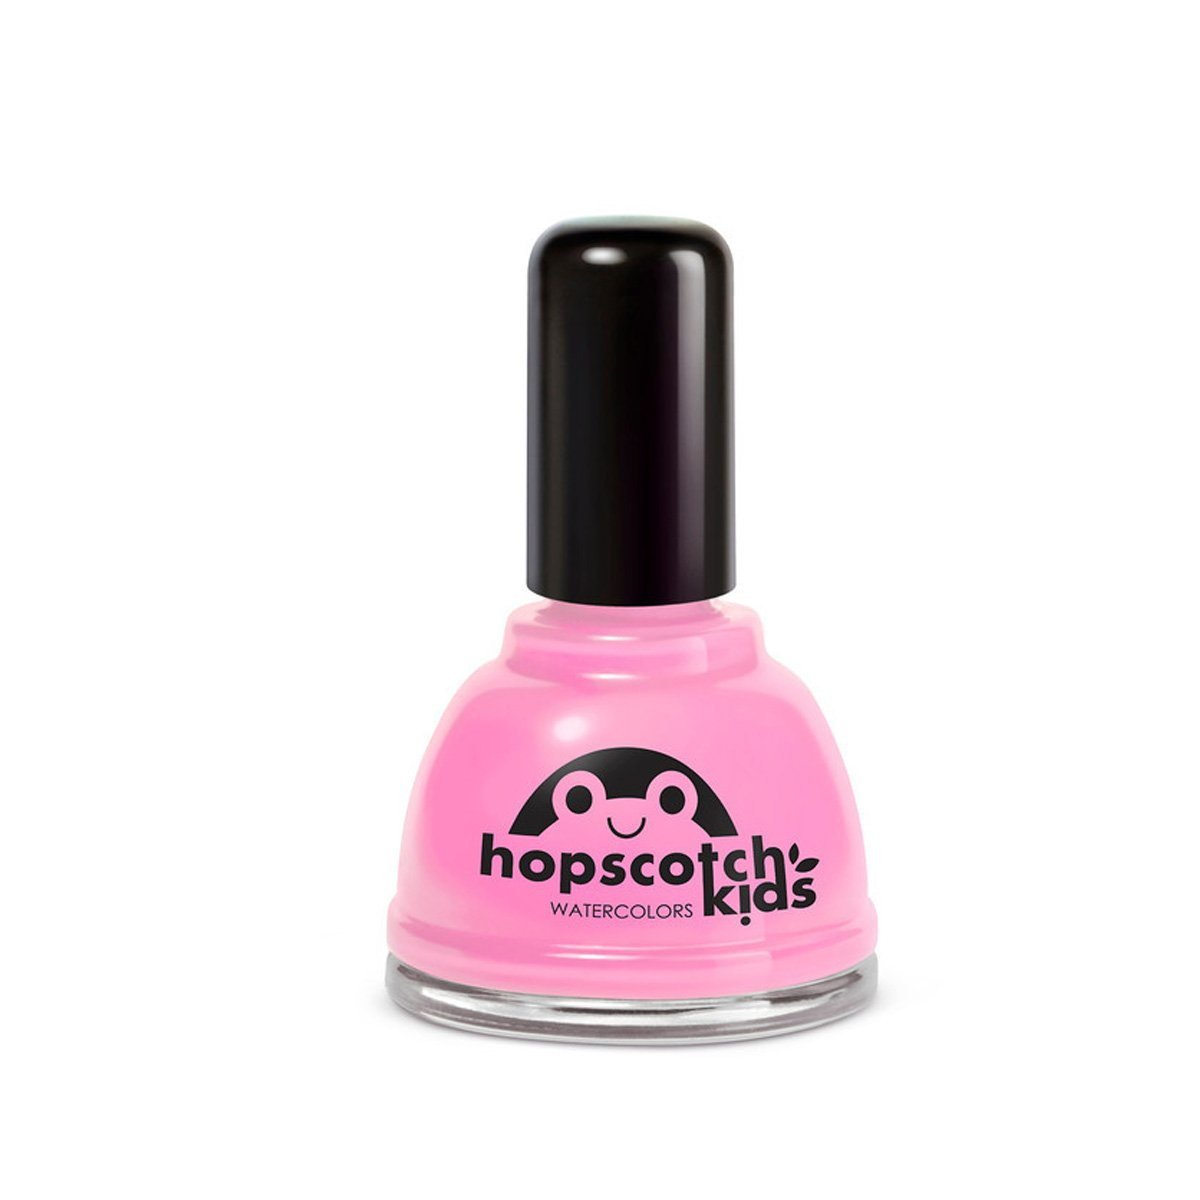 Hopscotch Kids nail polish, warnanya membuat kuku anak lebih berkilau. (Foto: Bukalapak)